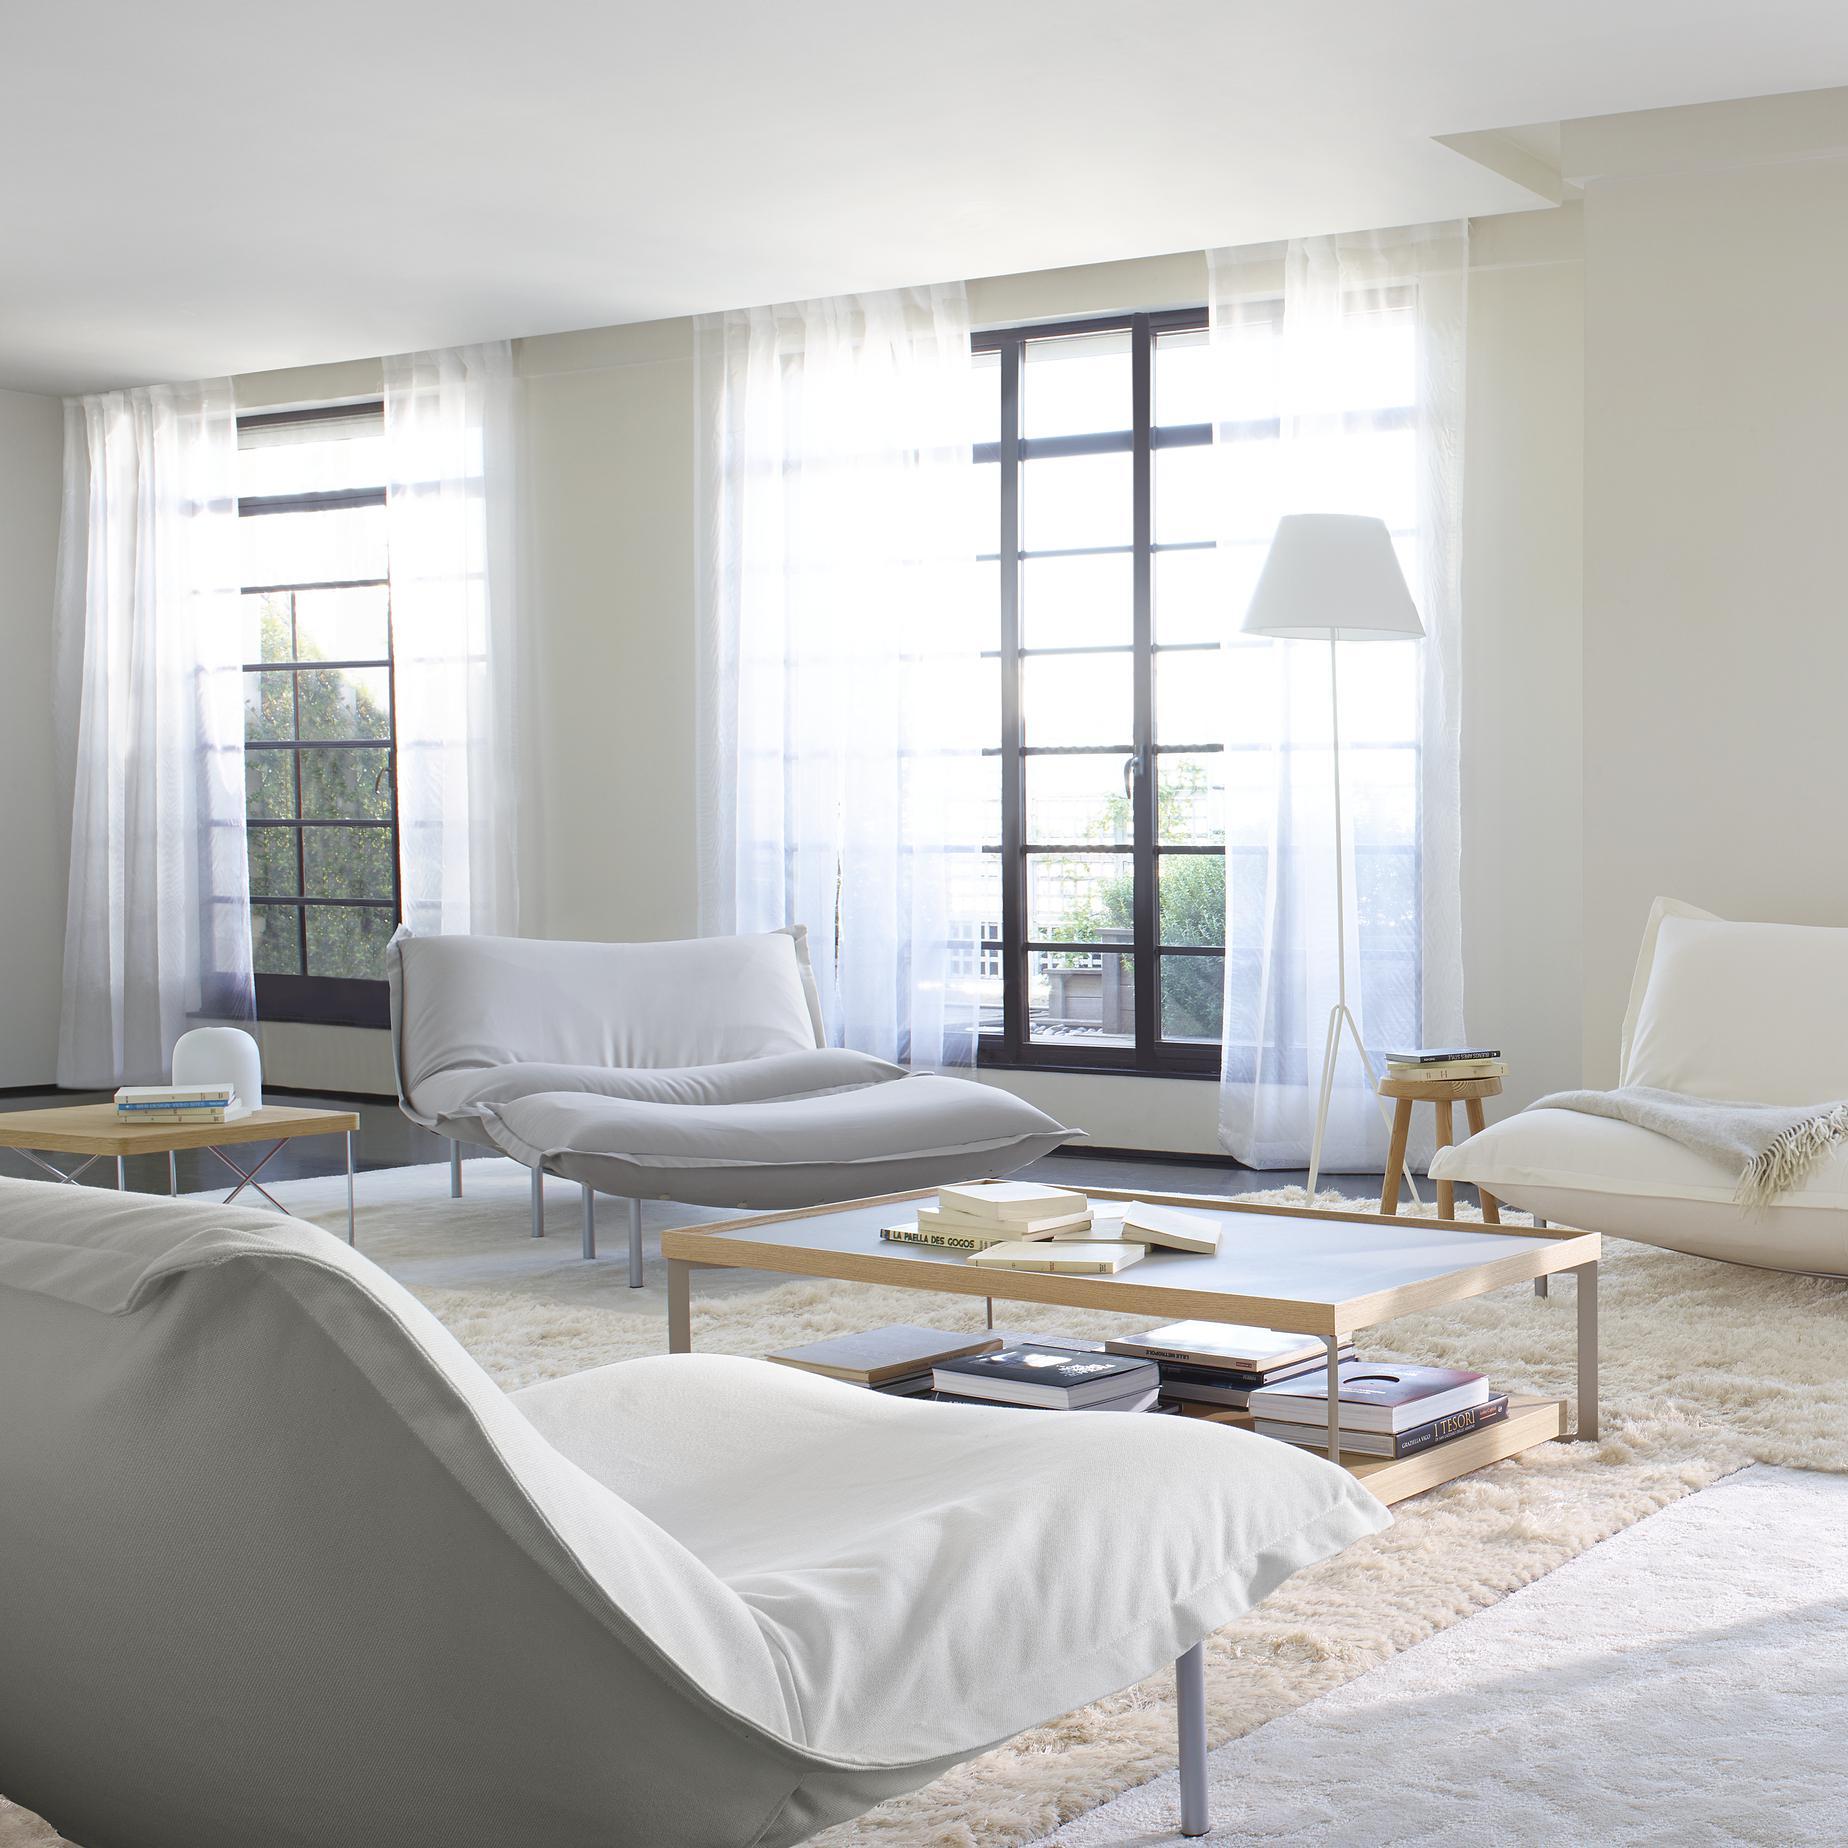 calin armchairs designer pascal mourgue ligne roset. Black Bedroom Furniture Sets. Home Design Ideas